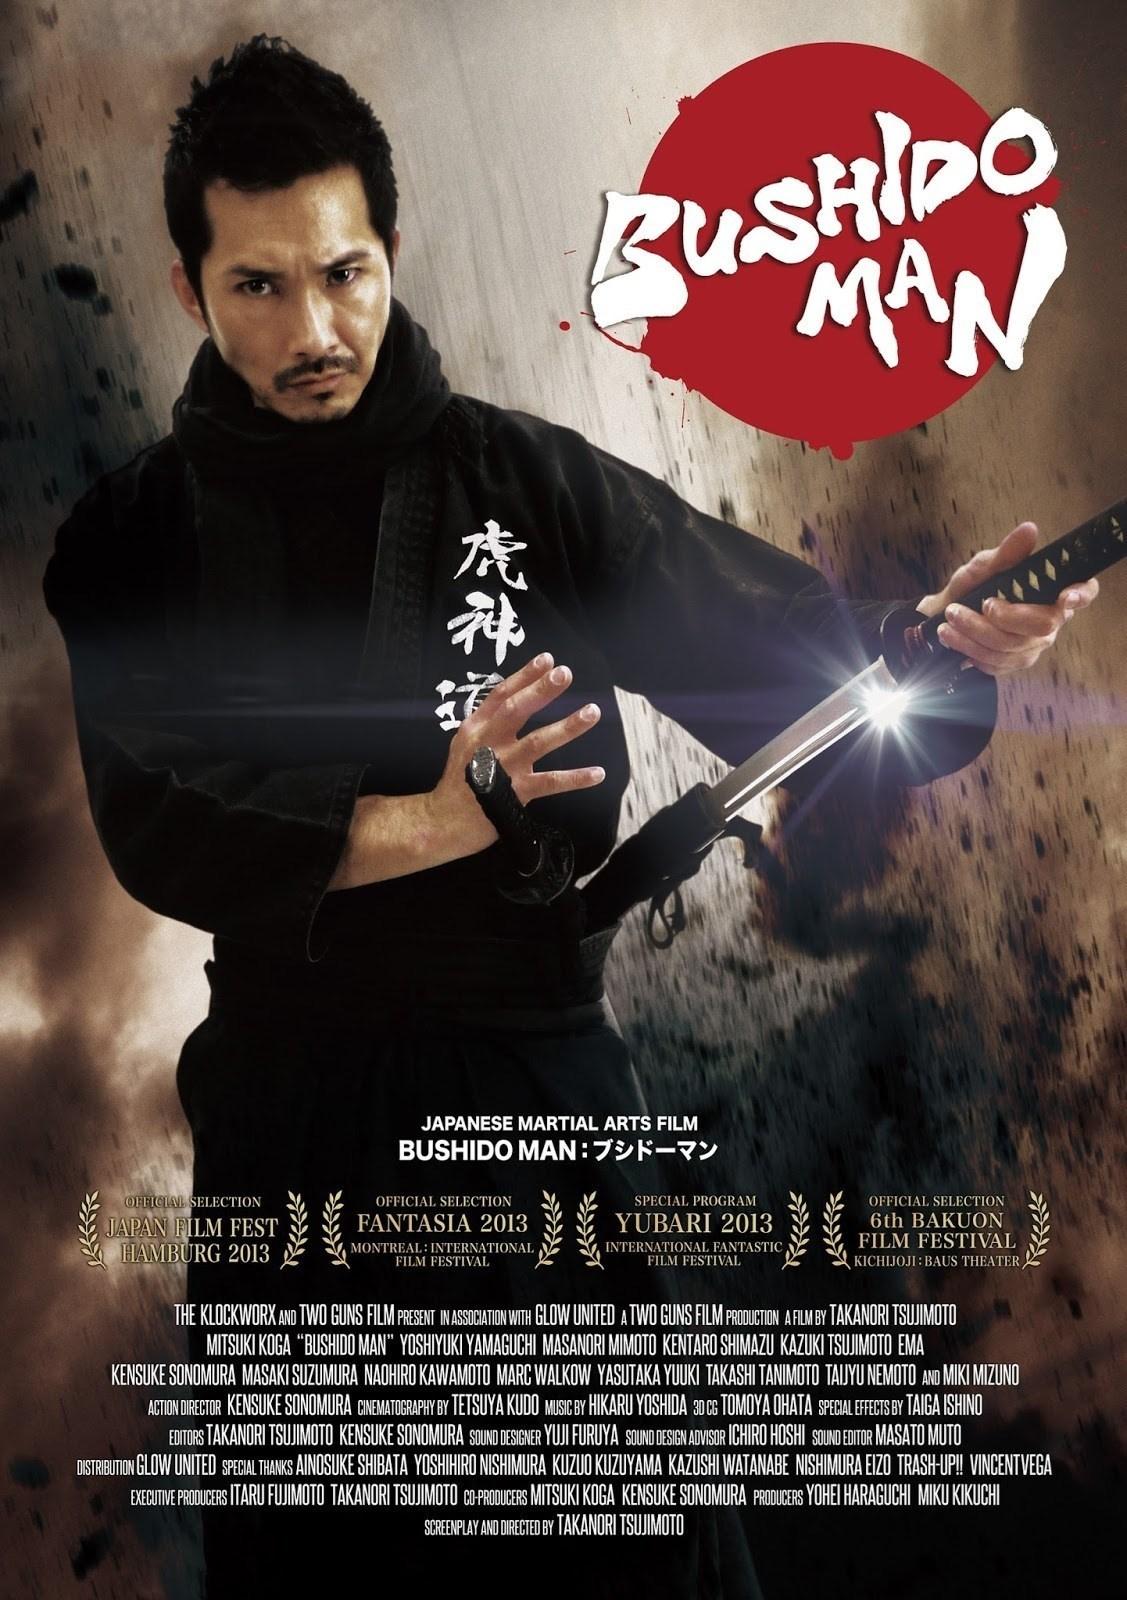 download bushido man 2013 bluray 720p subtitle indonesia